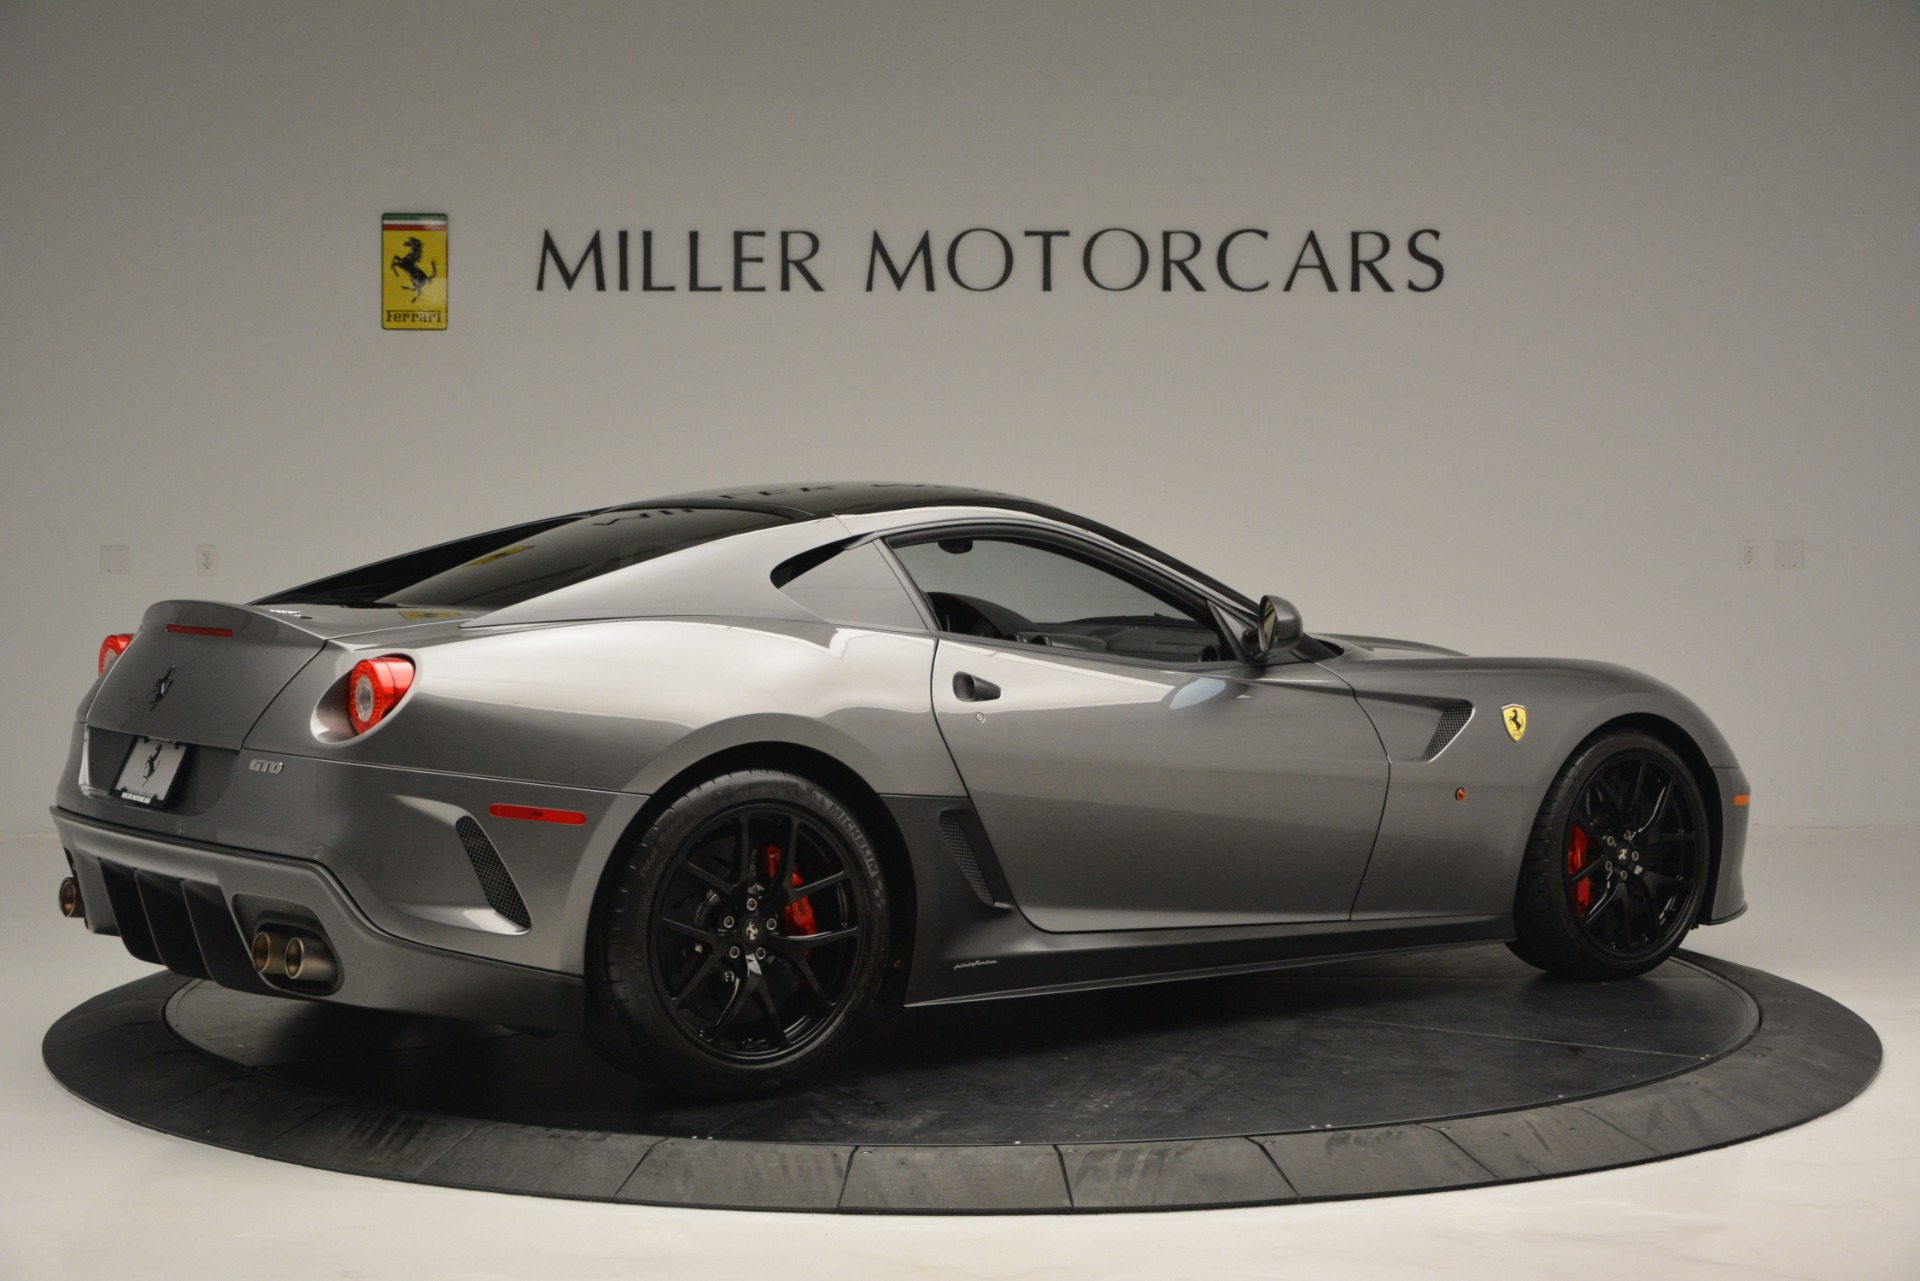 Used 2011 Ferrari 599 GTO  For Sale In Westport, CT 2724_p8